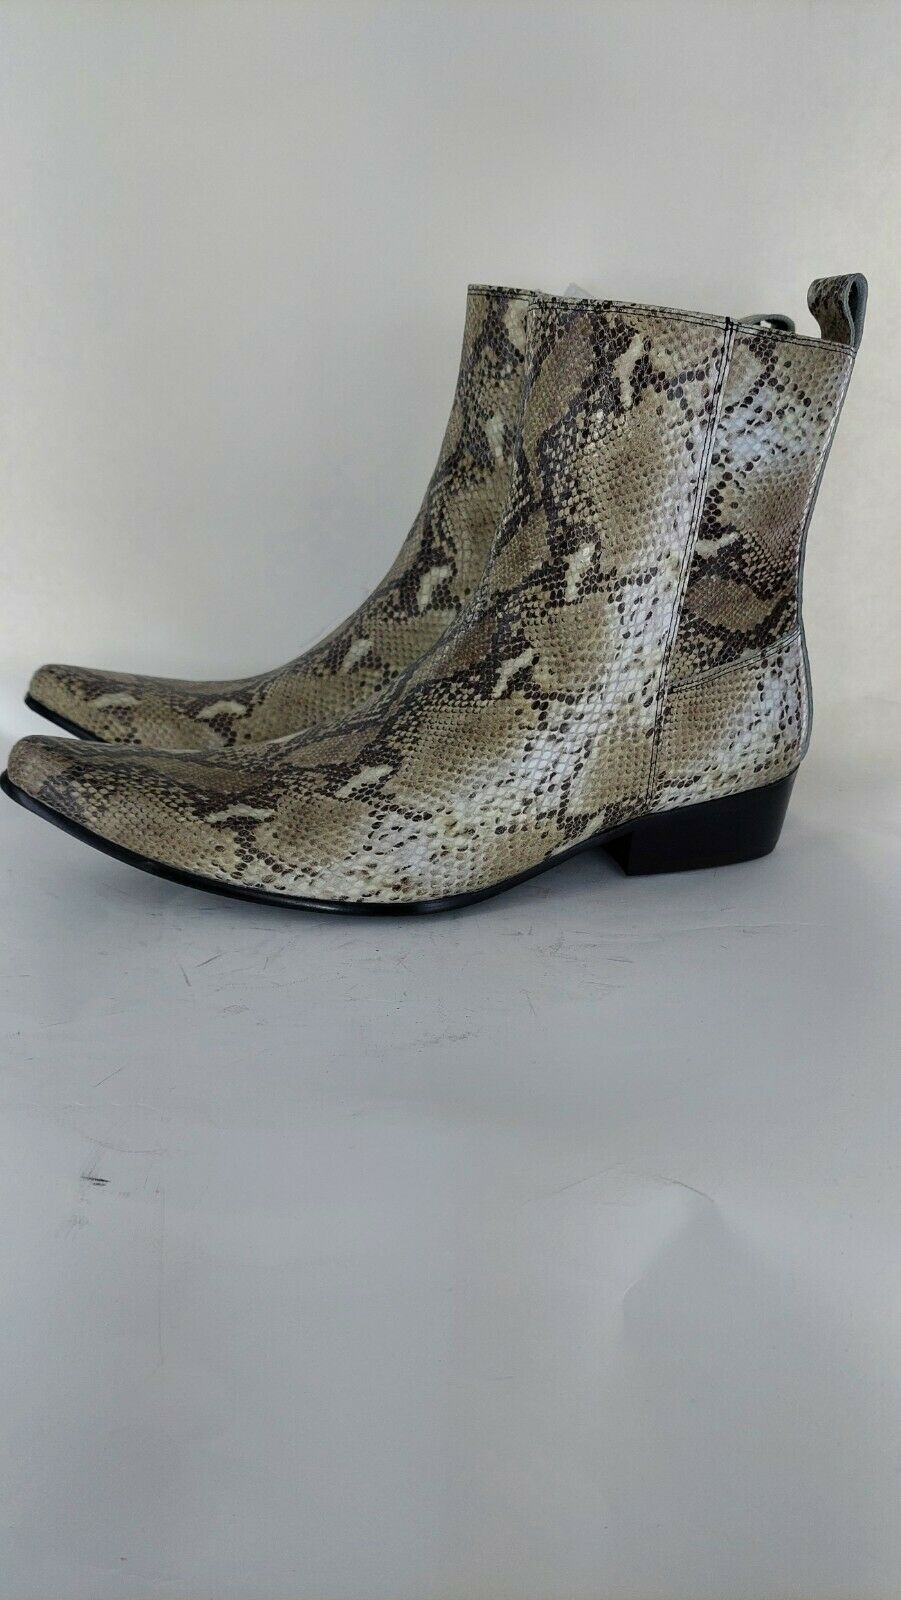 Club Cubano LENNON Mens Snake Leather Cuban Heel Boots Python UK 10#821